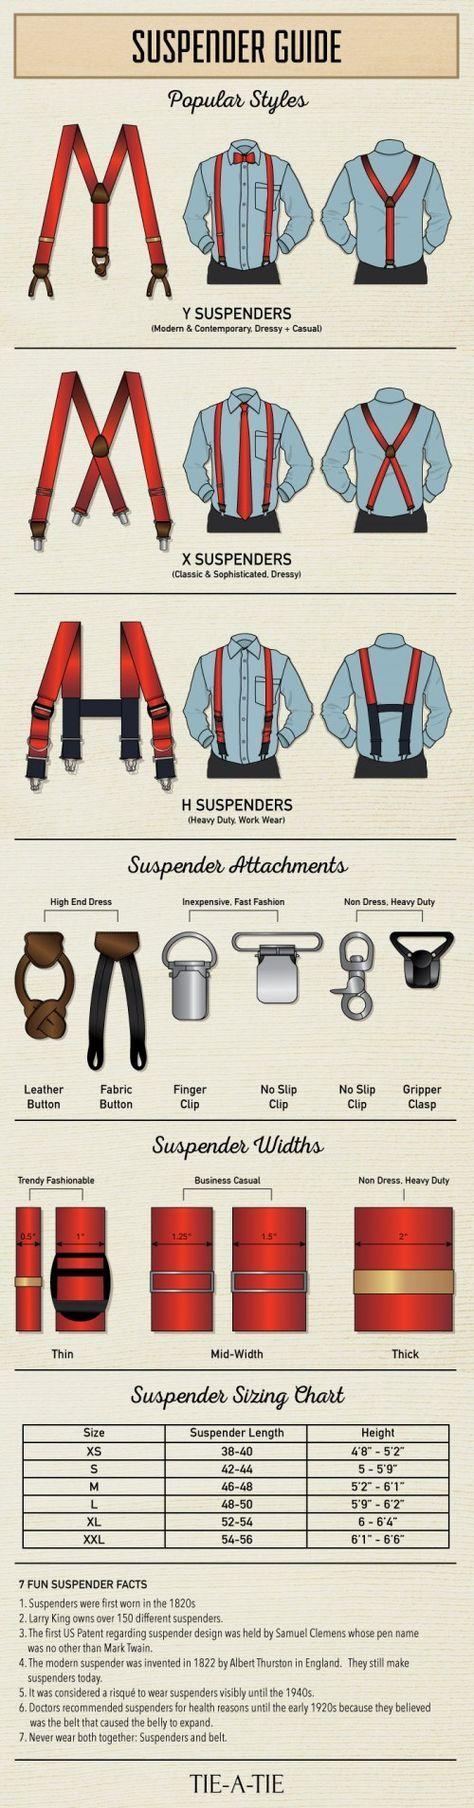 How-to-wear-suspenders